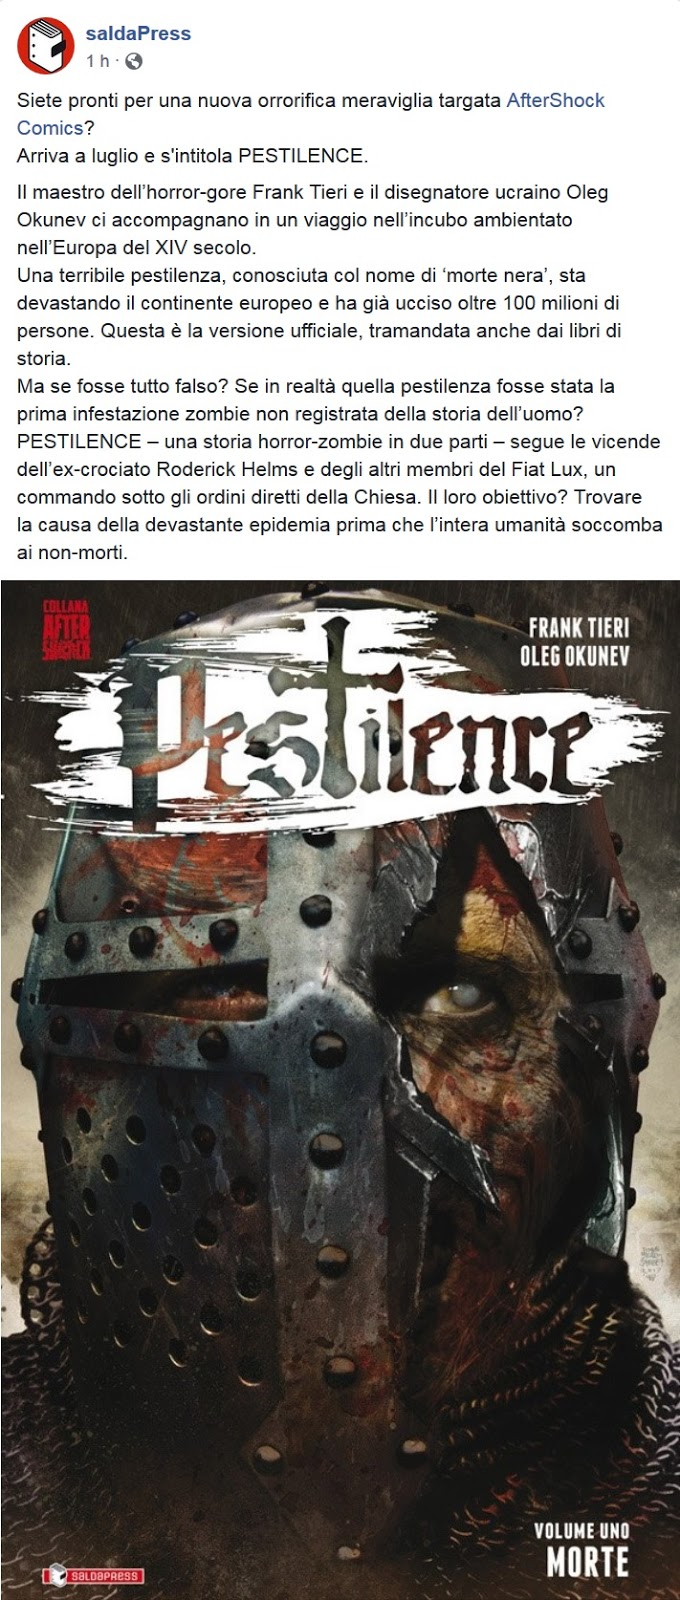 Pestilence (SaldaPress)